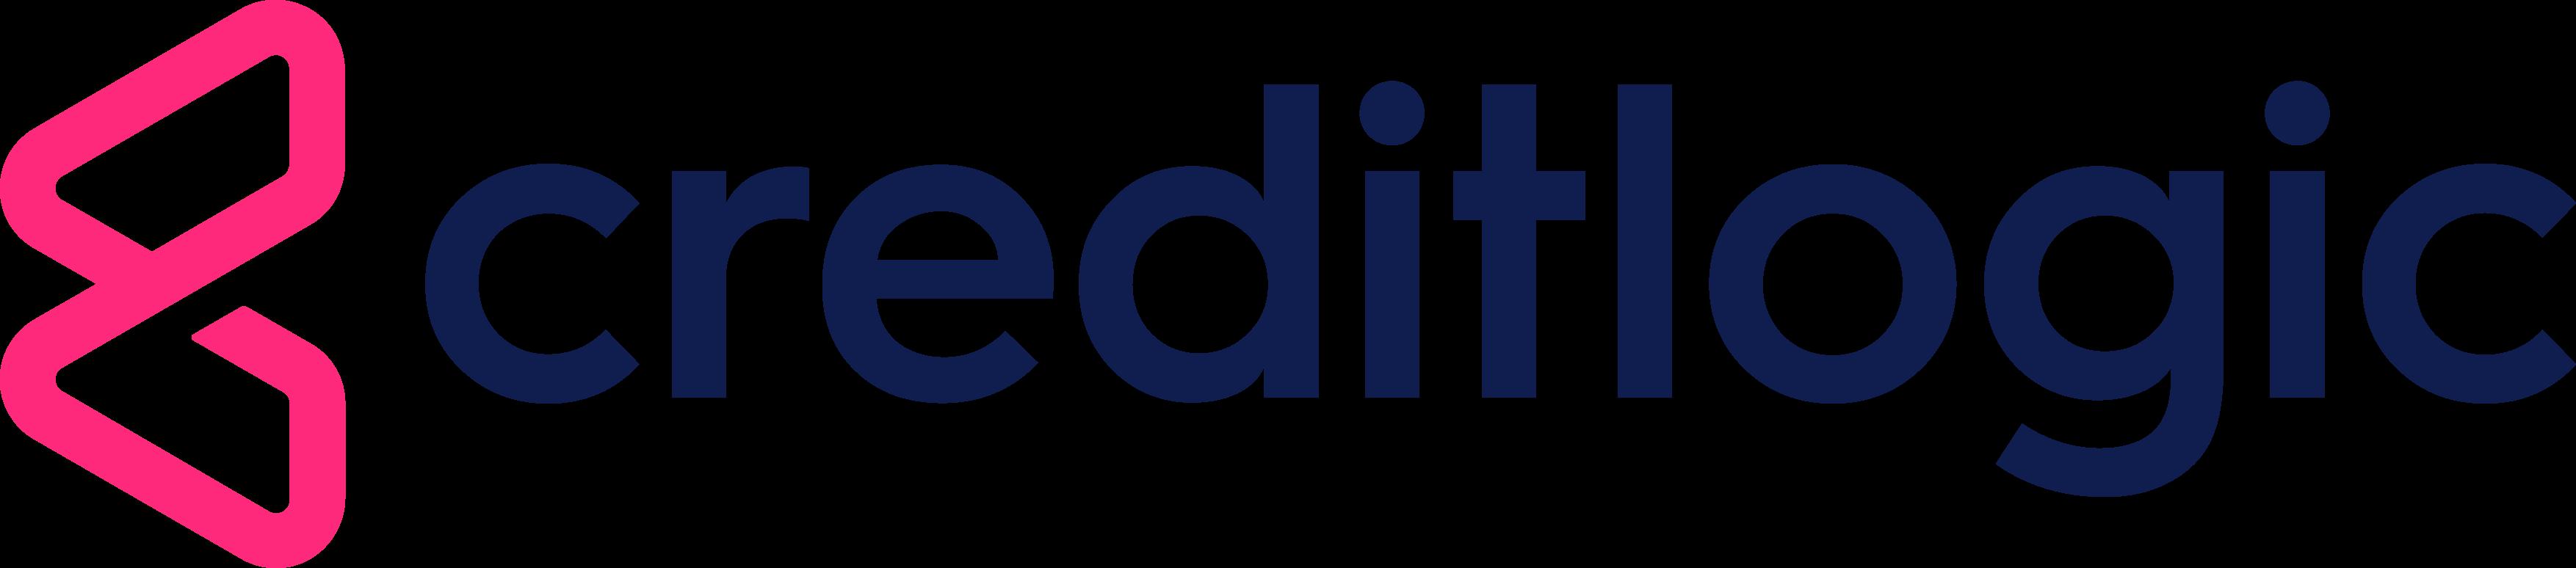 Creditlogic logo